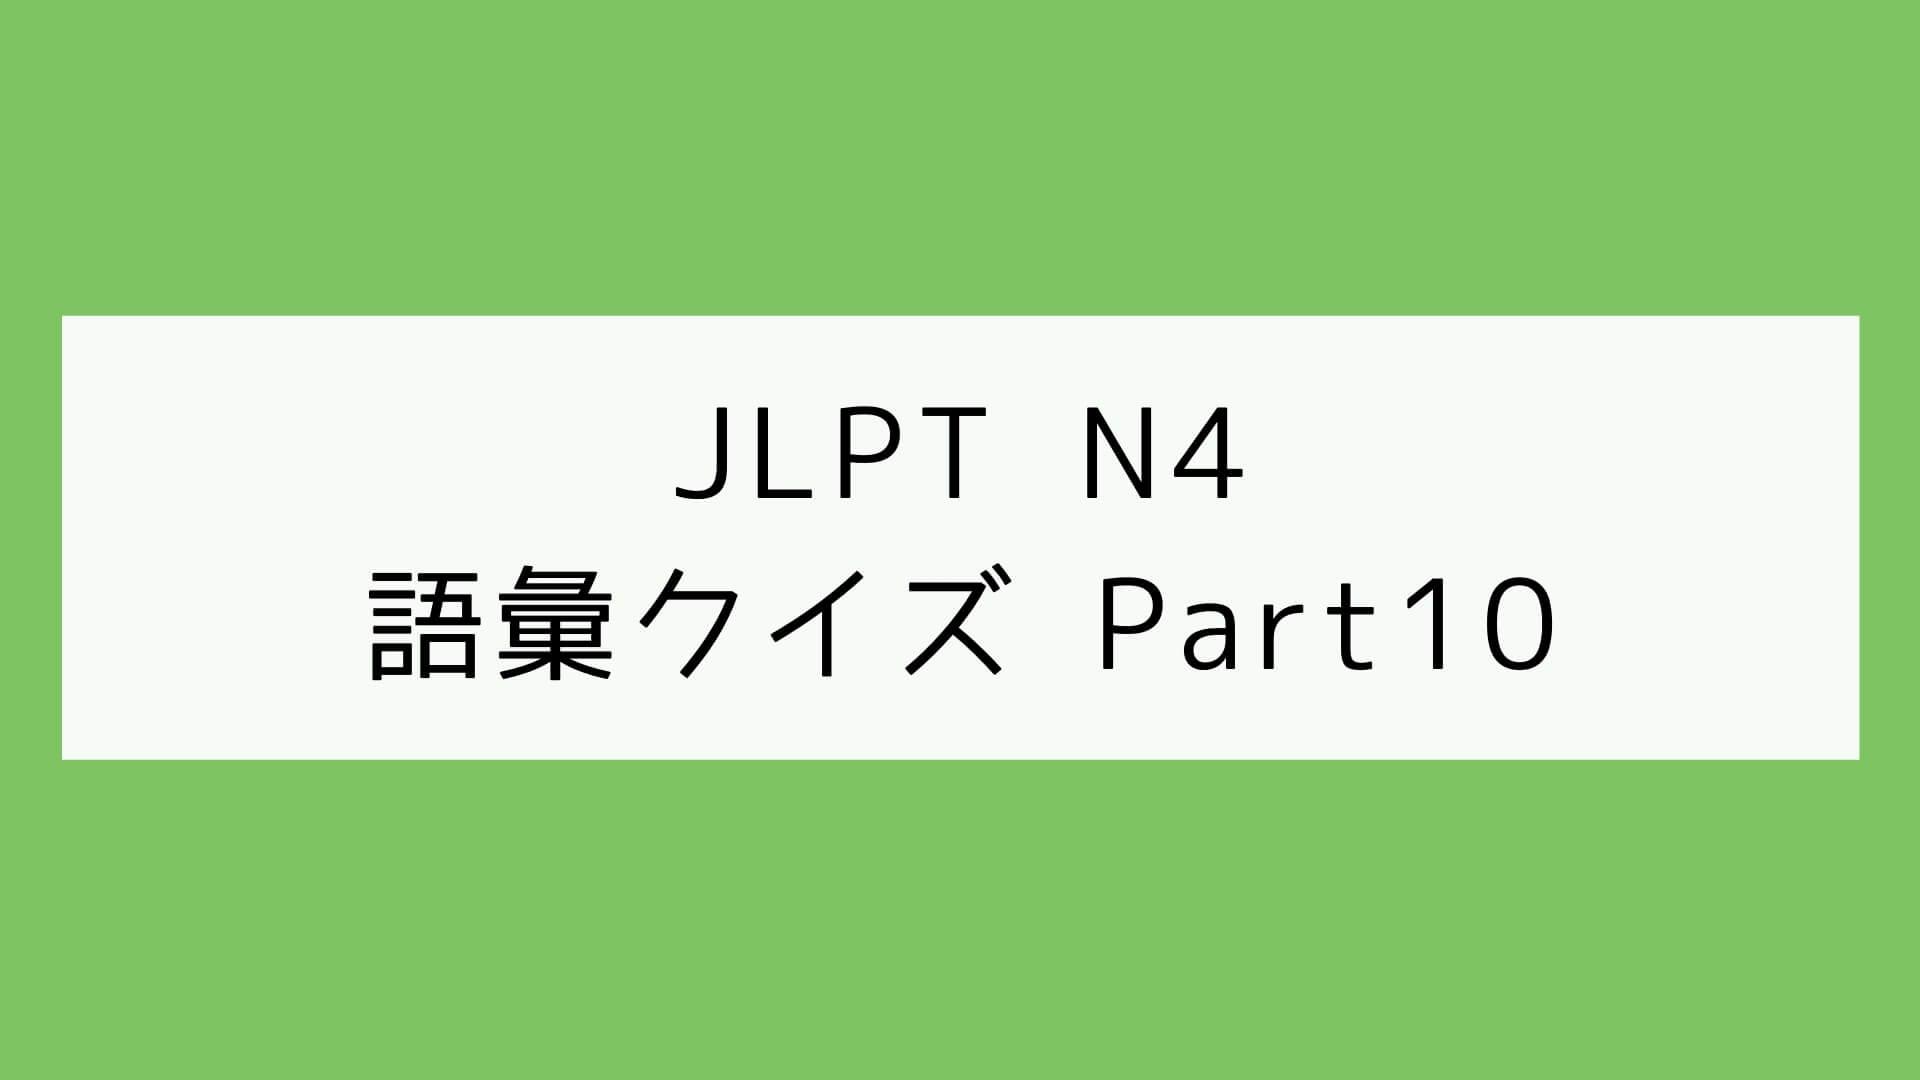 【JLPT N4】語彙クイズ Part10